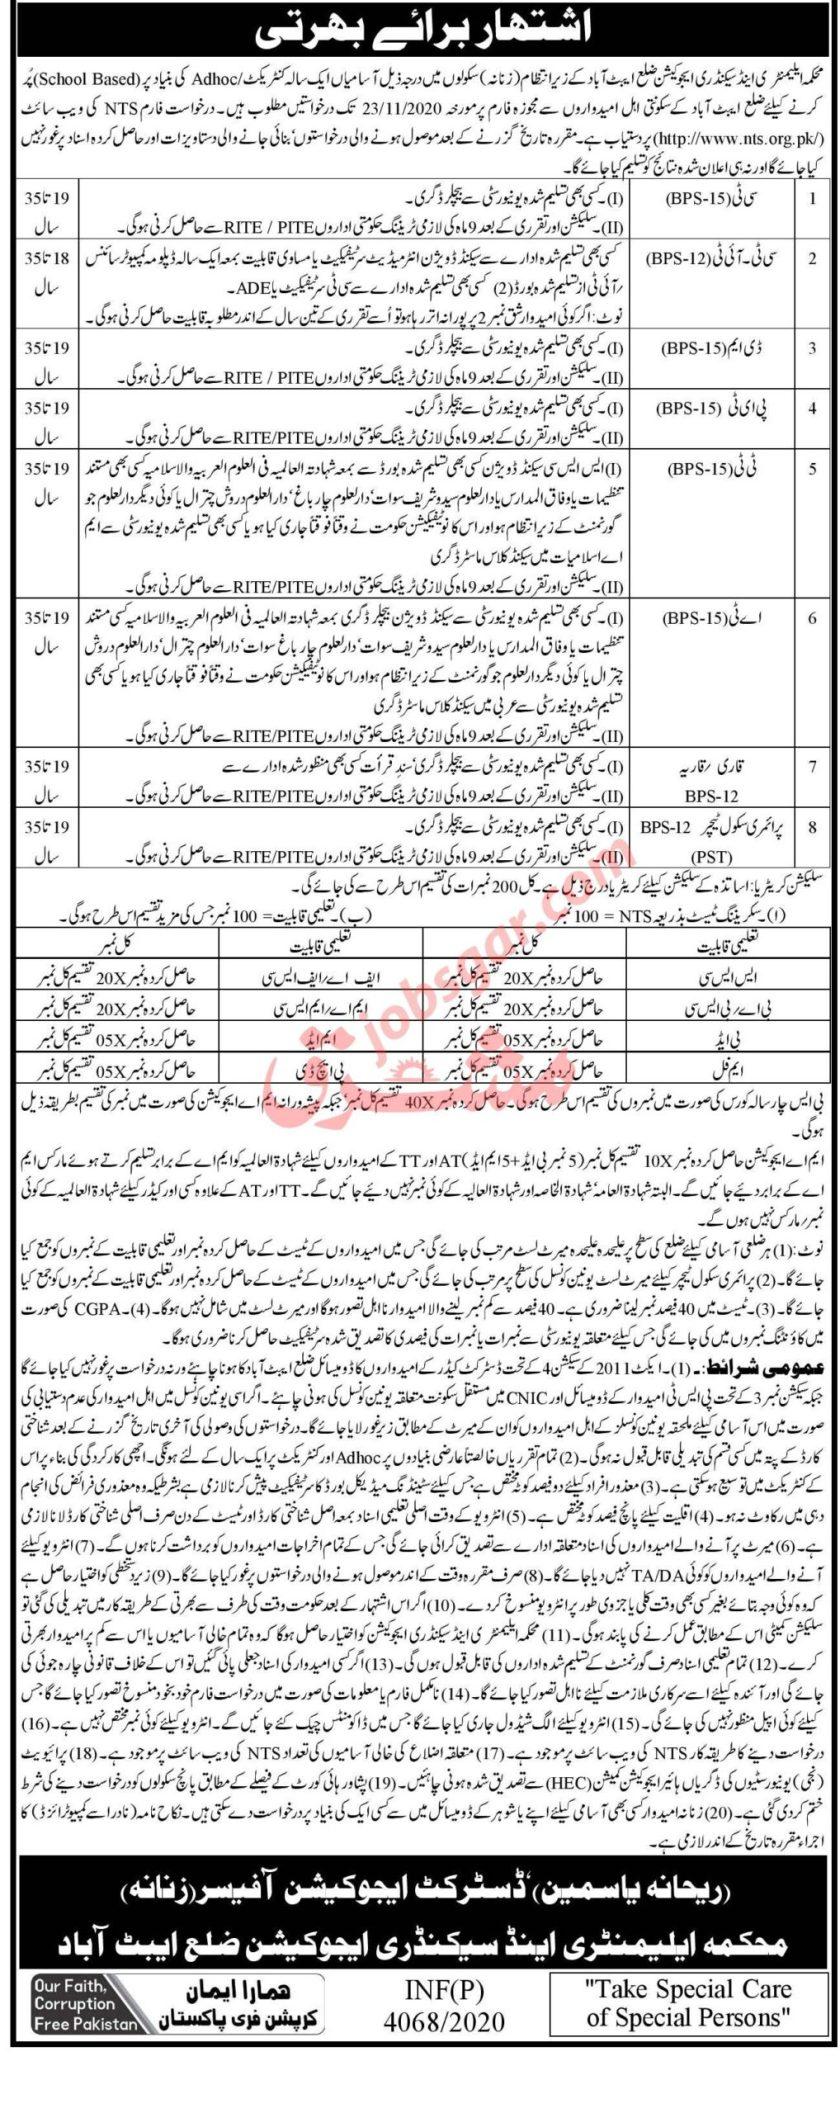 Elementary & Secondary Education Department Abbottabad KPK ESED Jobs 2020